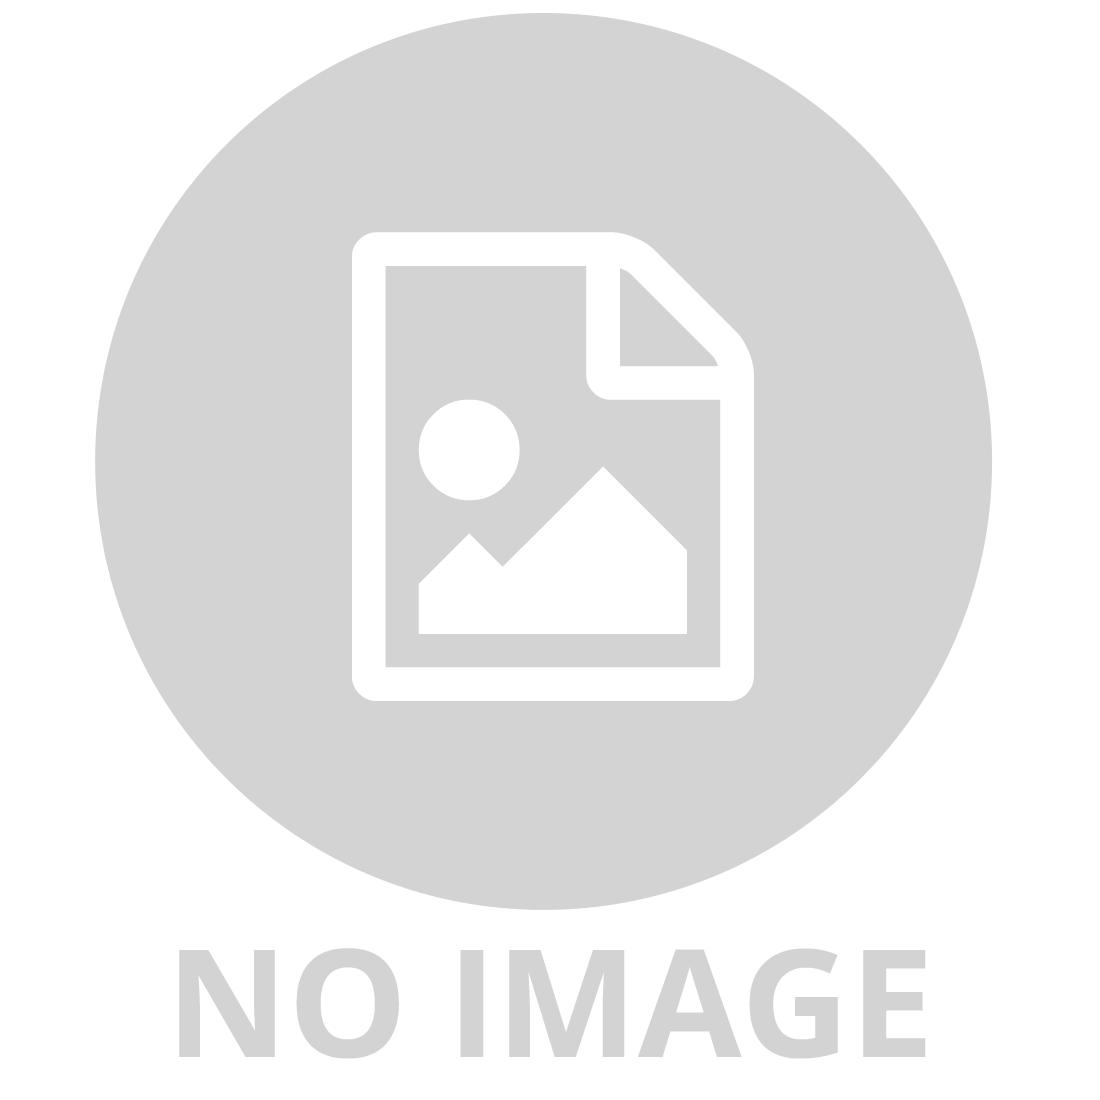 FISHER PRICE IMAGINEXT DC SUPER FRIENDS SUPERMAN & METALLO